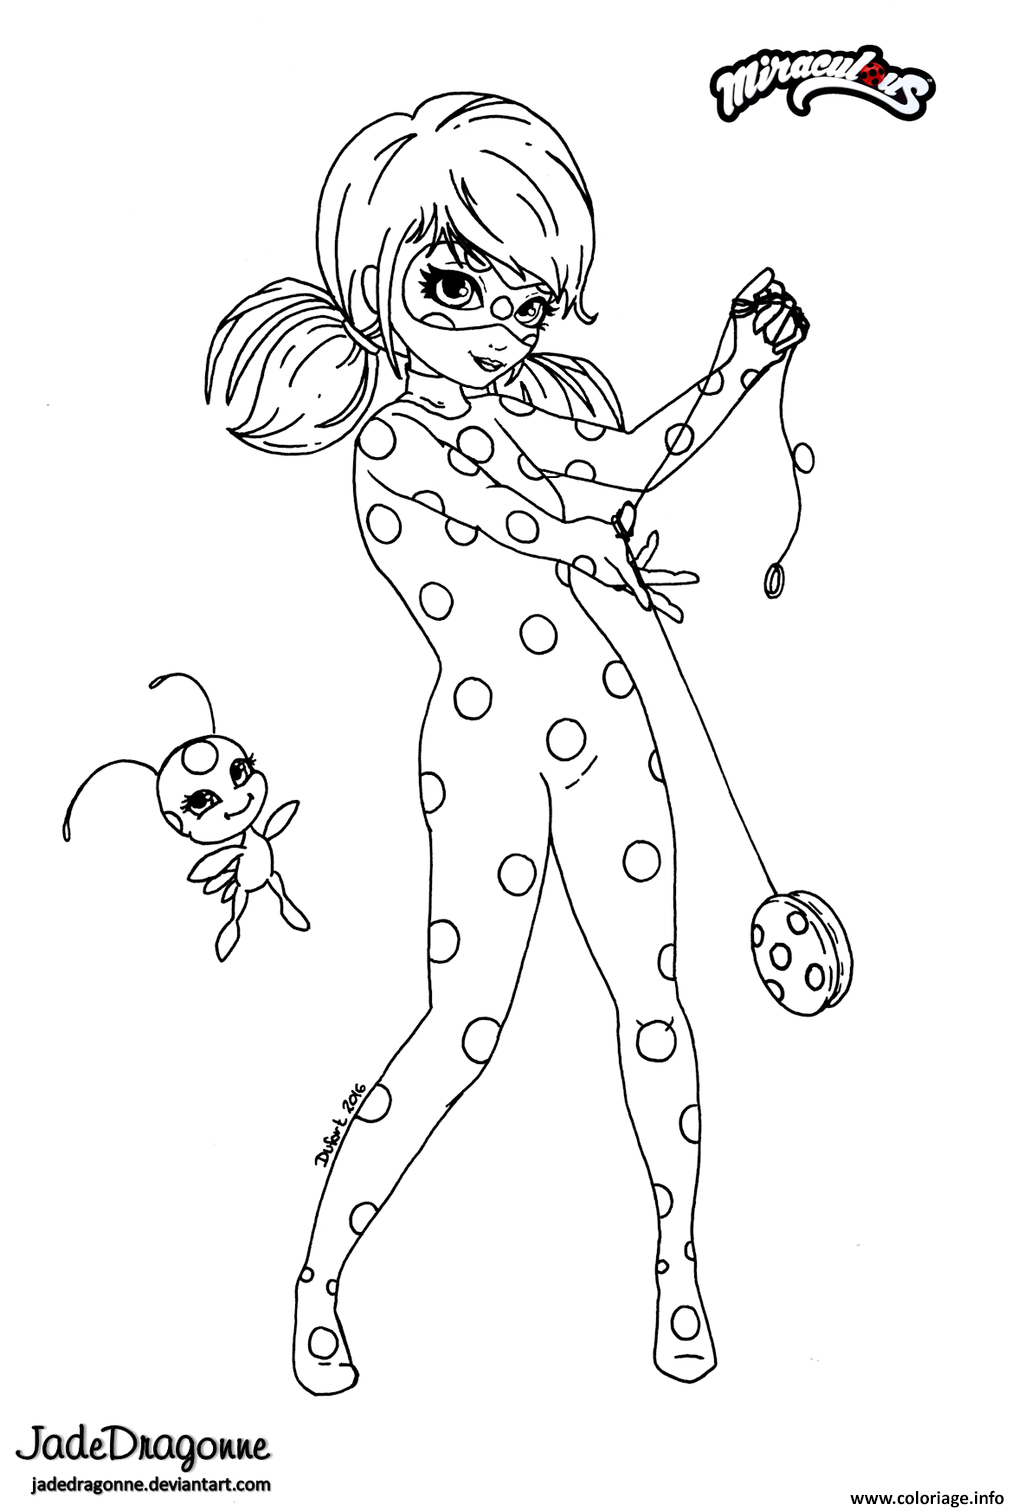 Coloriage miraculous ladybug anime par jade dessin - Dessin imprimer ...